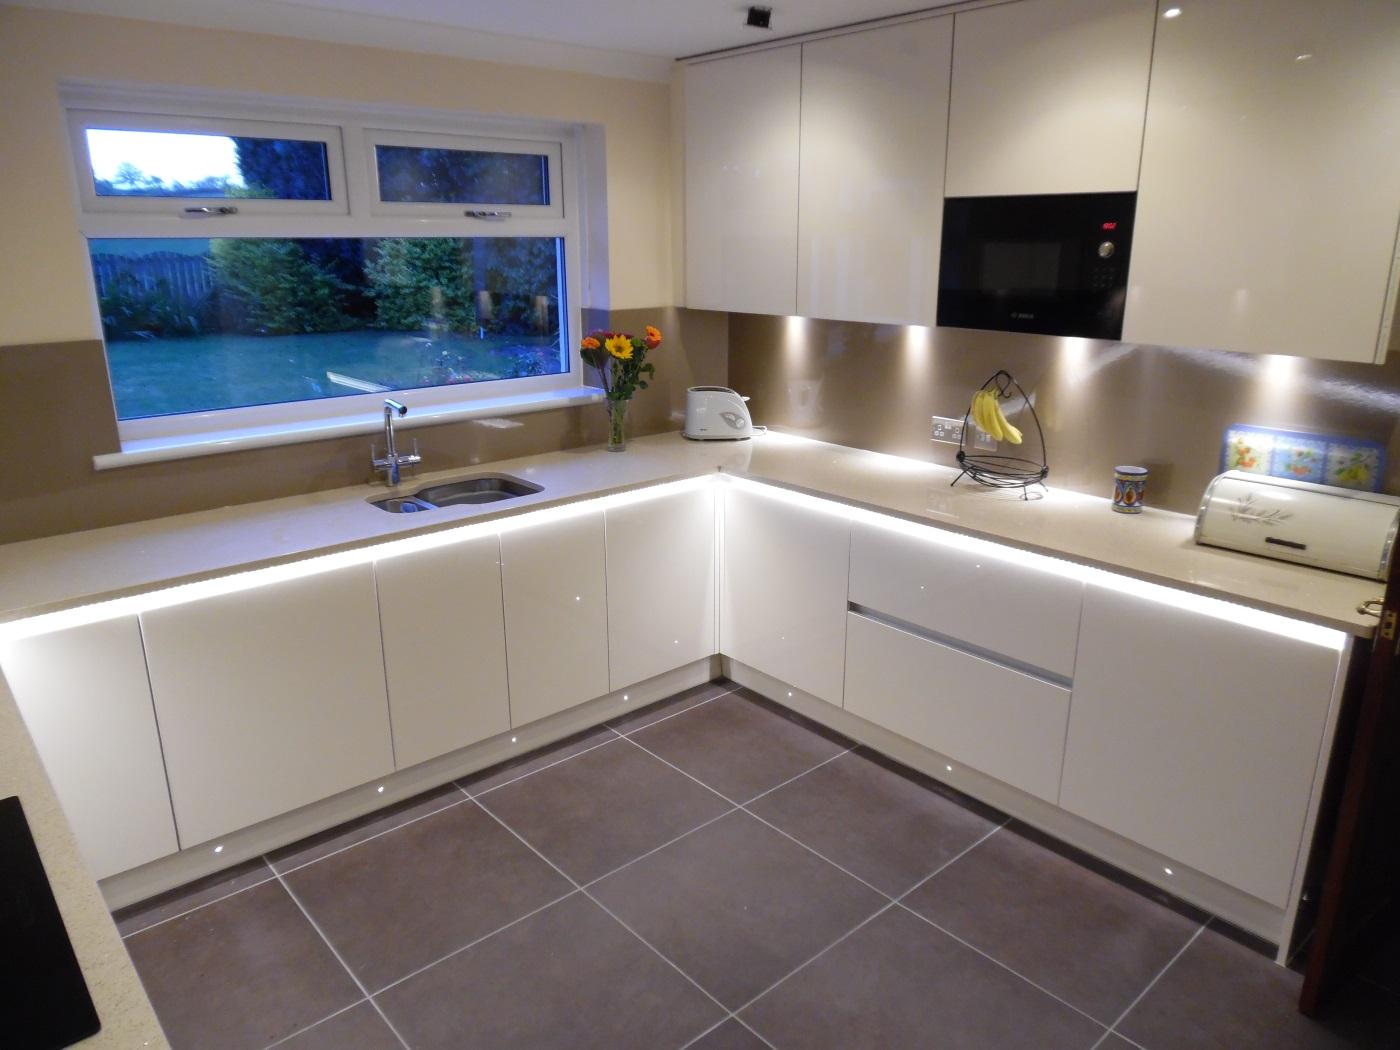 Finished Kitchen Installation Clarkston